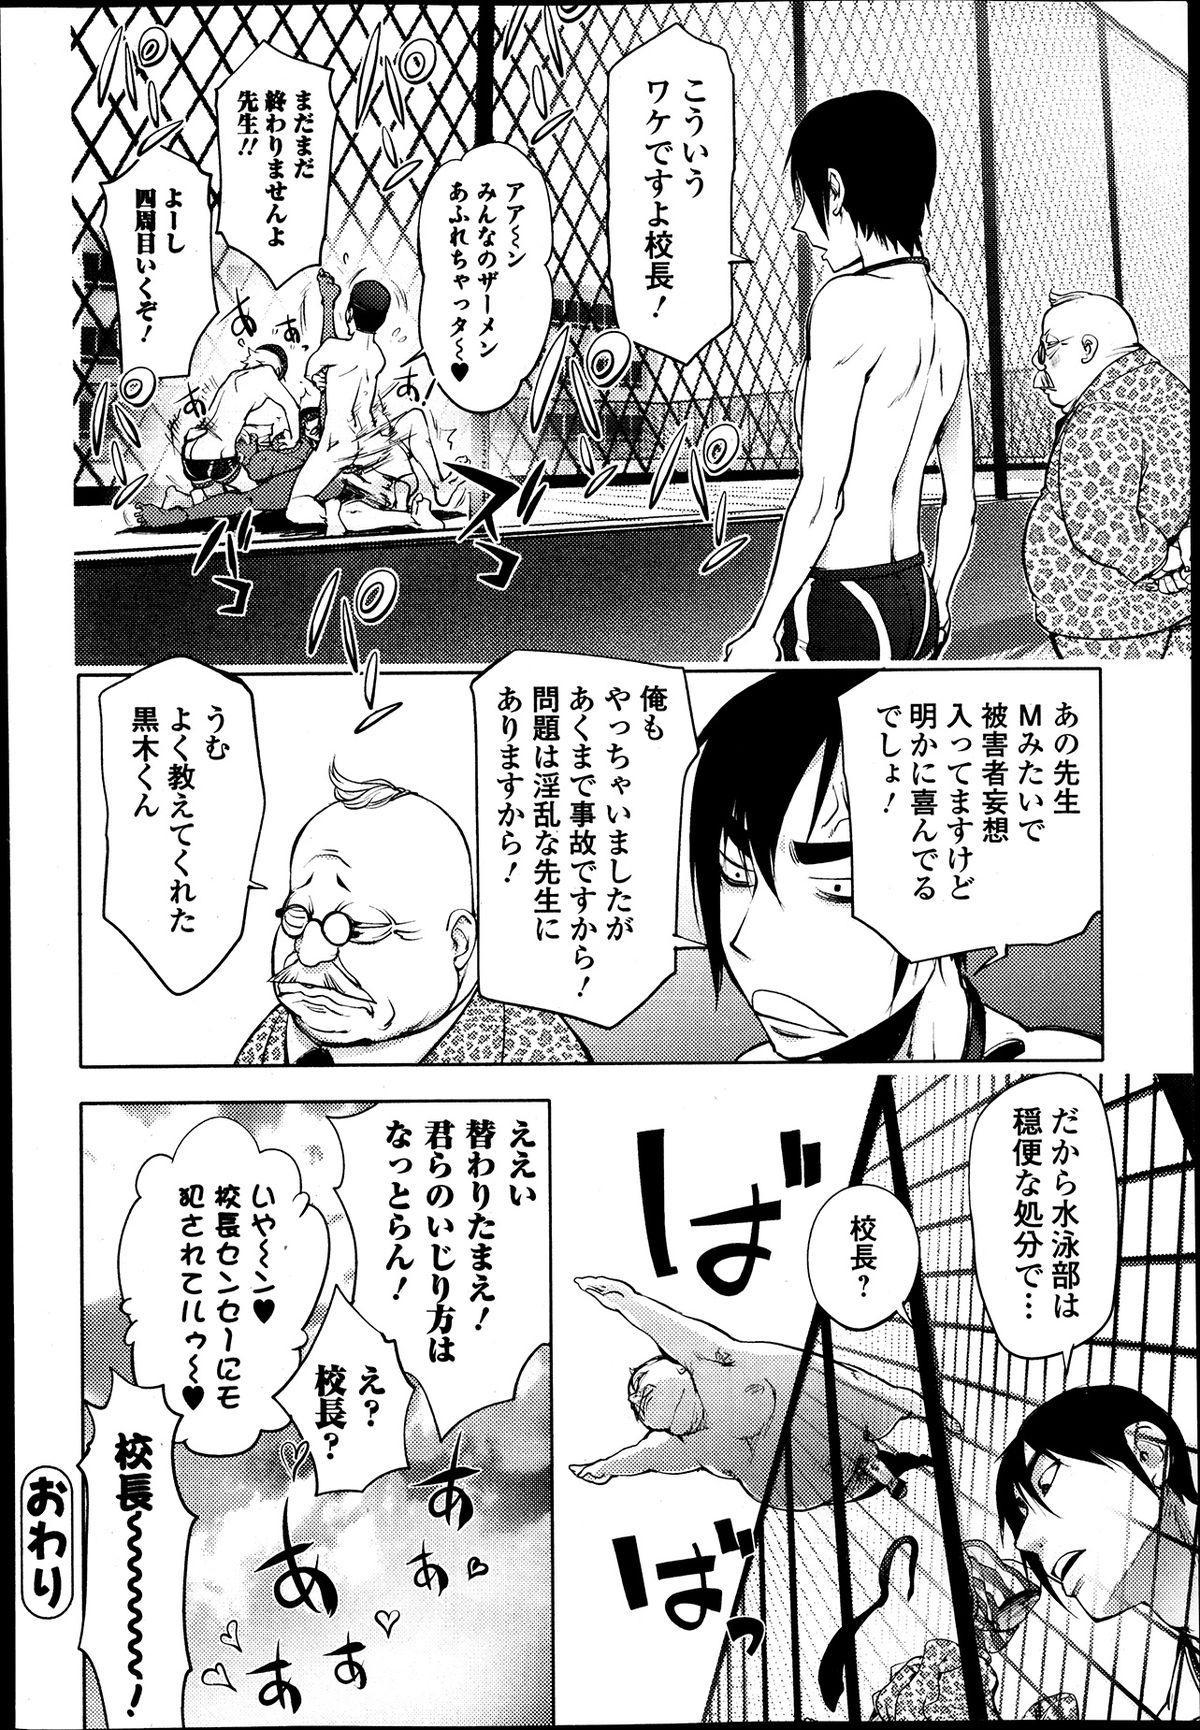 Bishoujo Kakumei KIWAME Road Vol.9 67